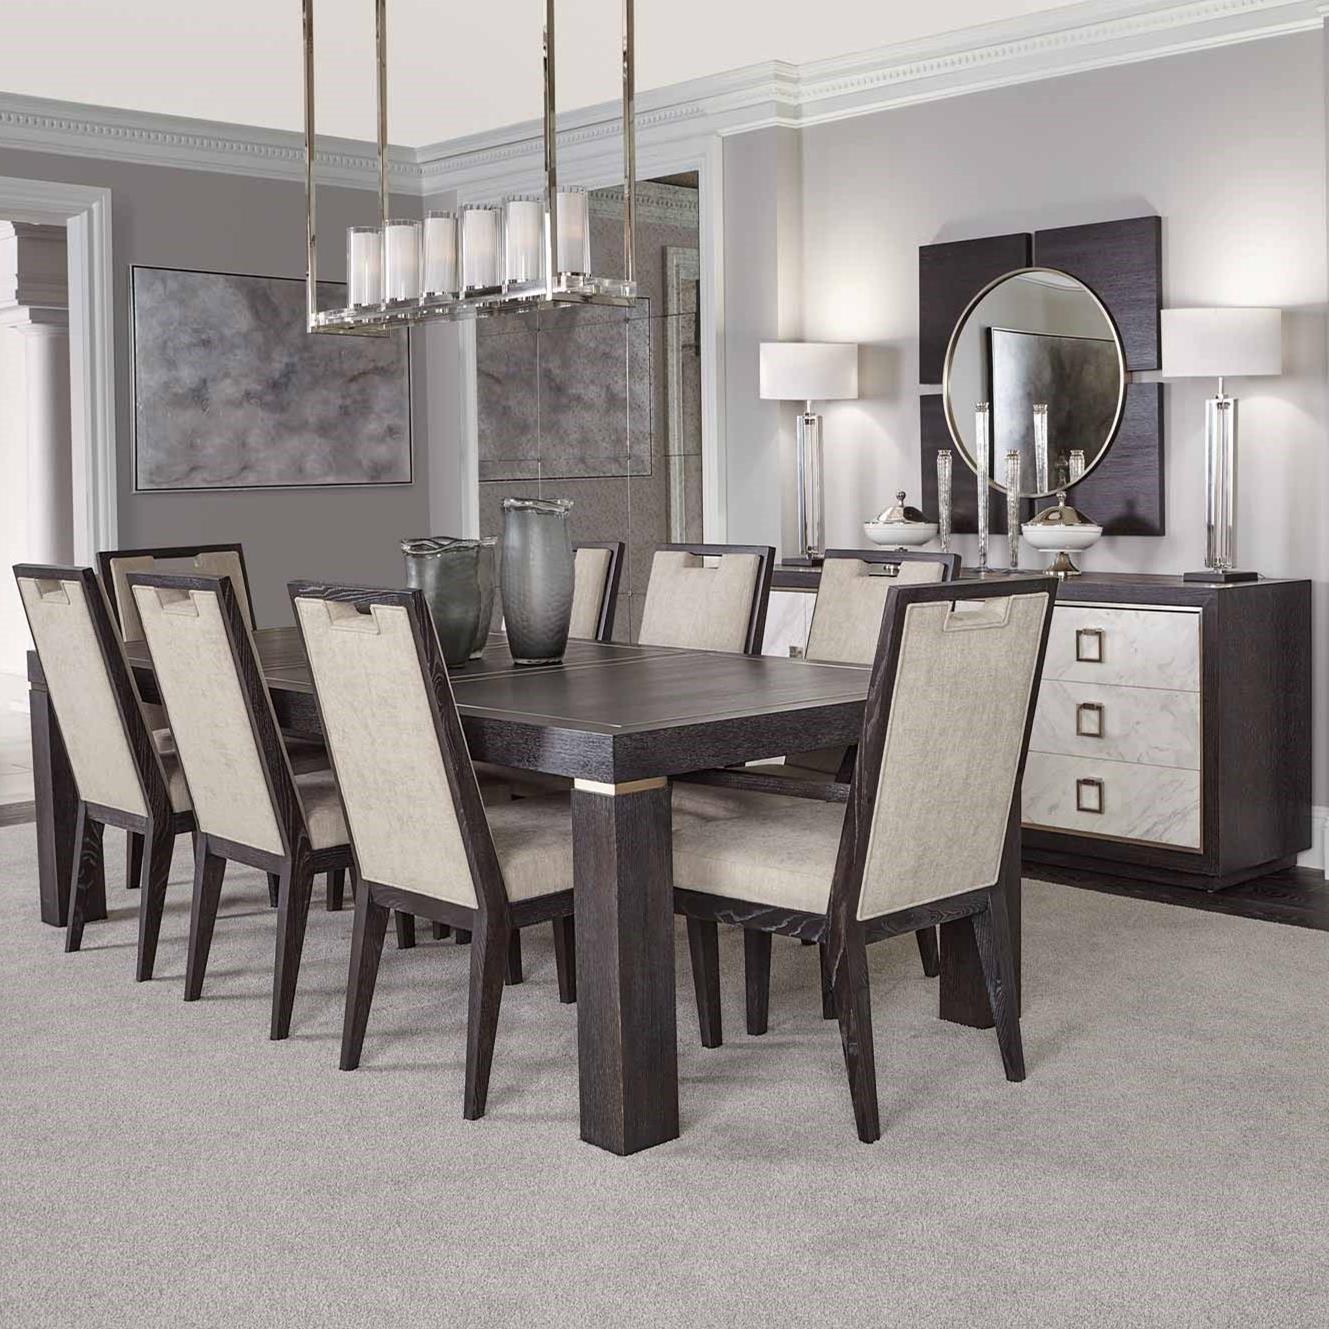 Decorage Formal Dining Room Group by Bernhardt at Baer's Furniture